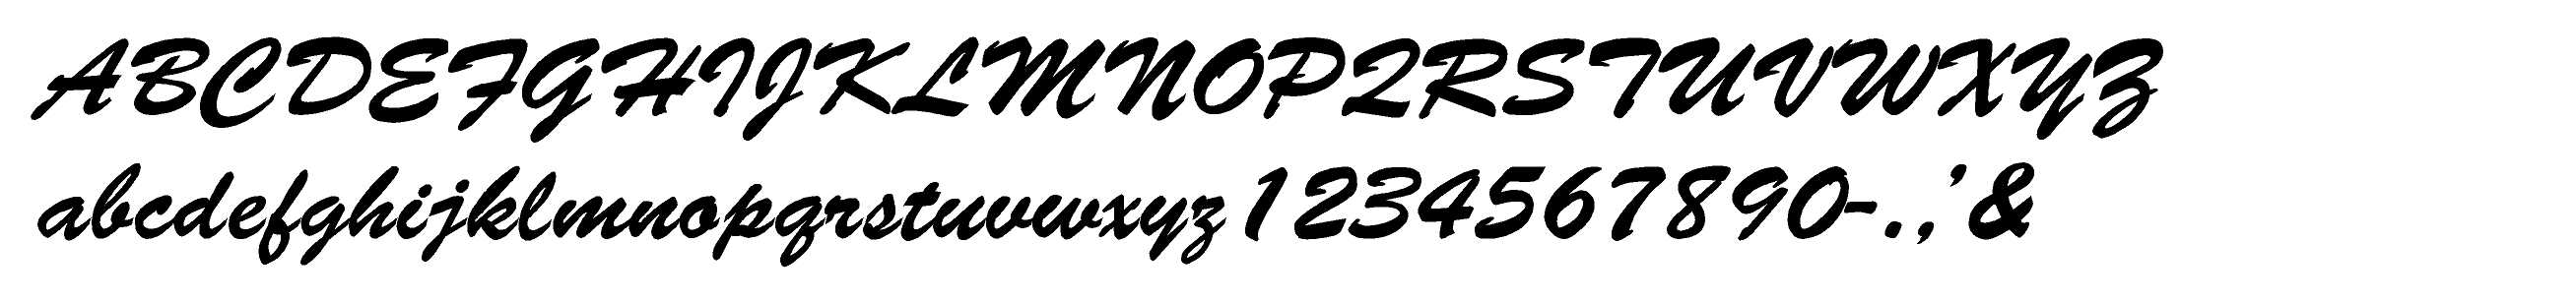 Brush Script Standard EZLit Type Style